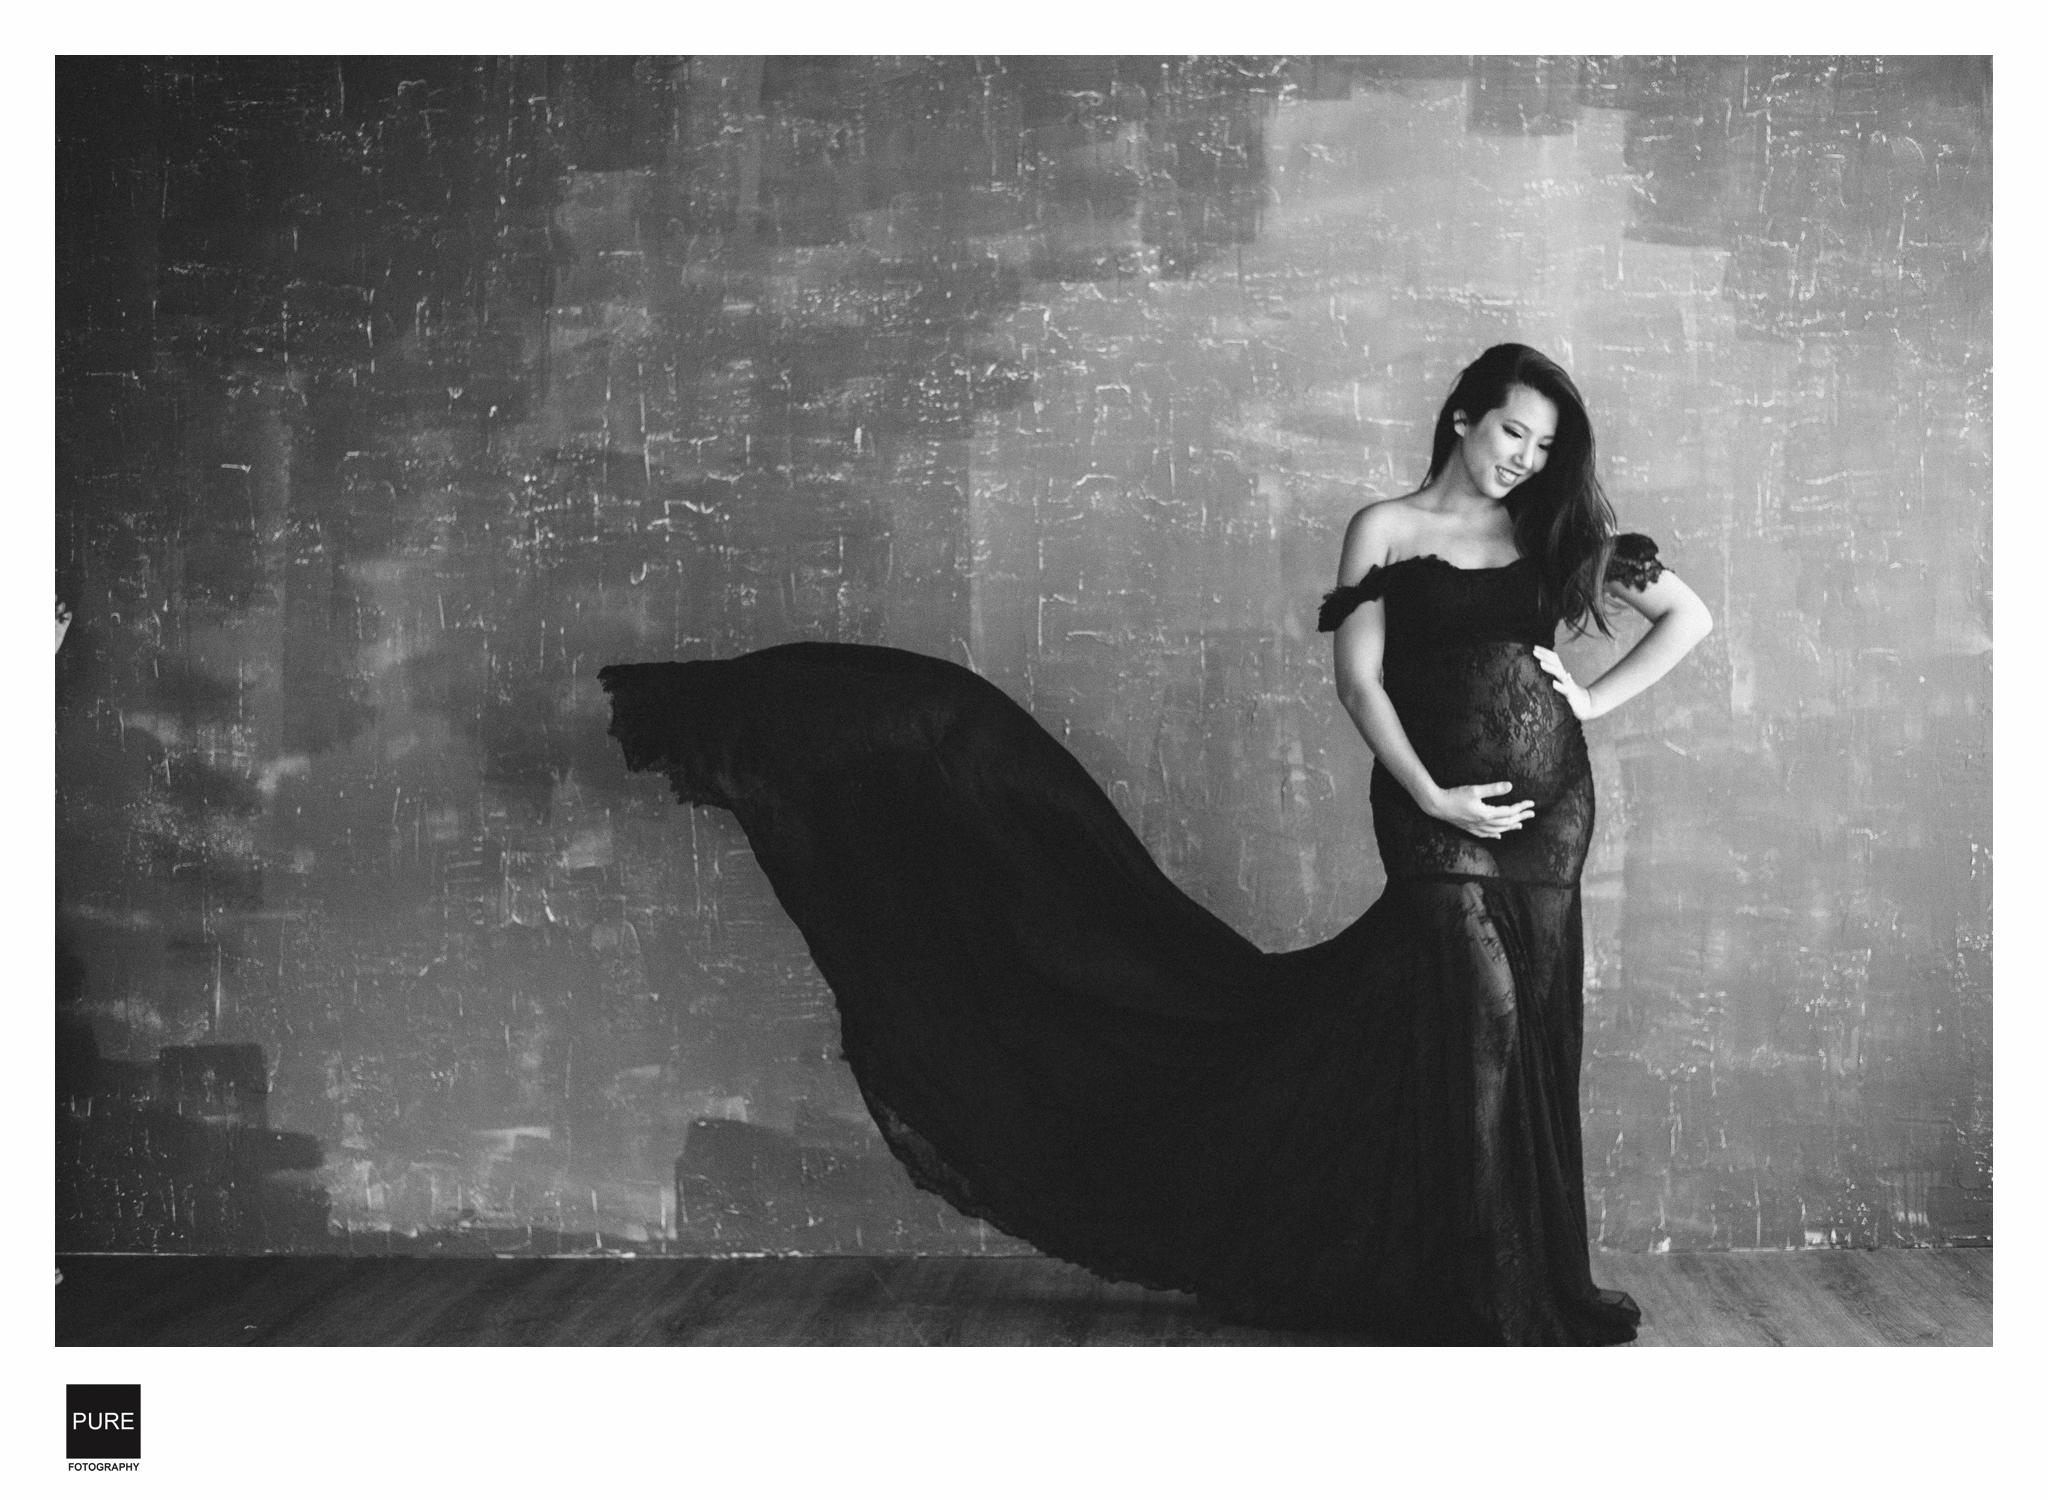 PUREFOTO_台灣孕婦攝影Pregnant_黑色紗質禮服孕婦寫真